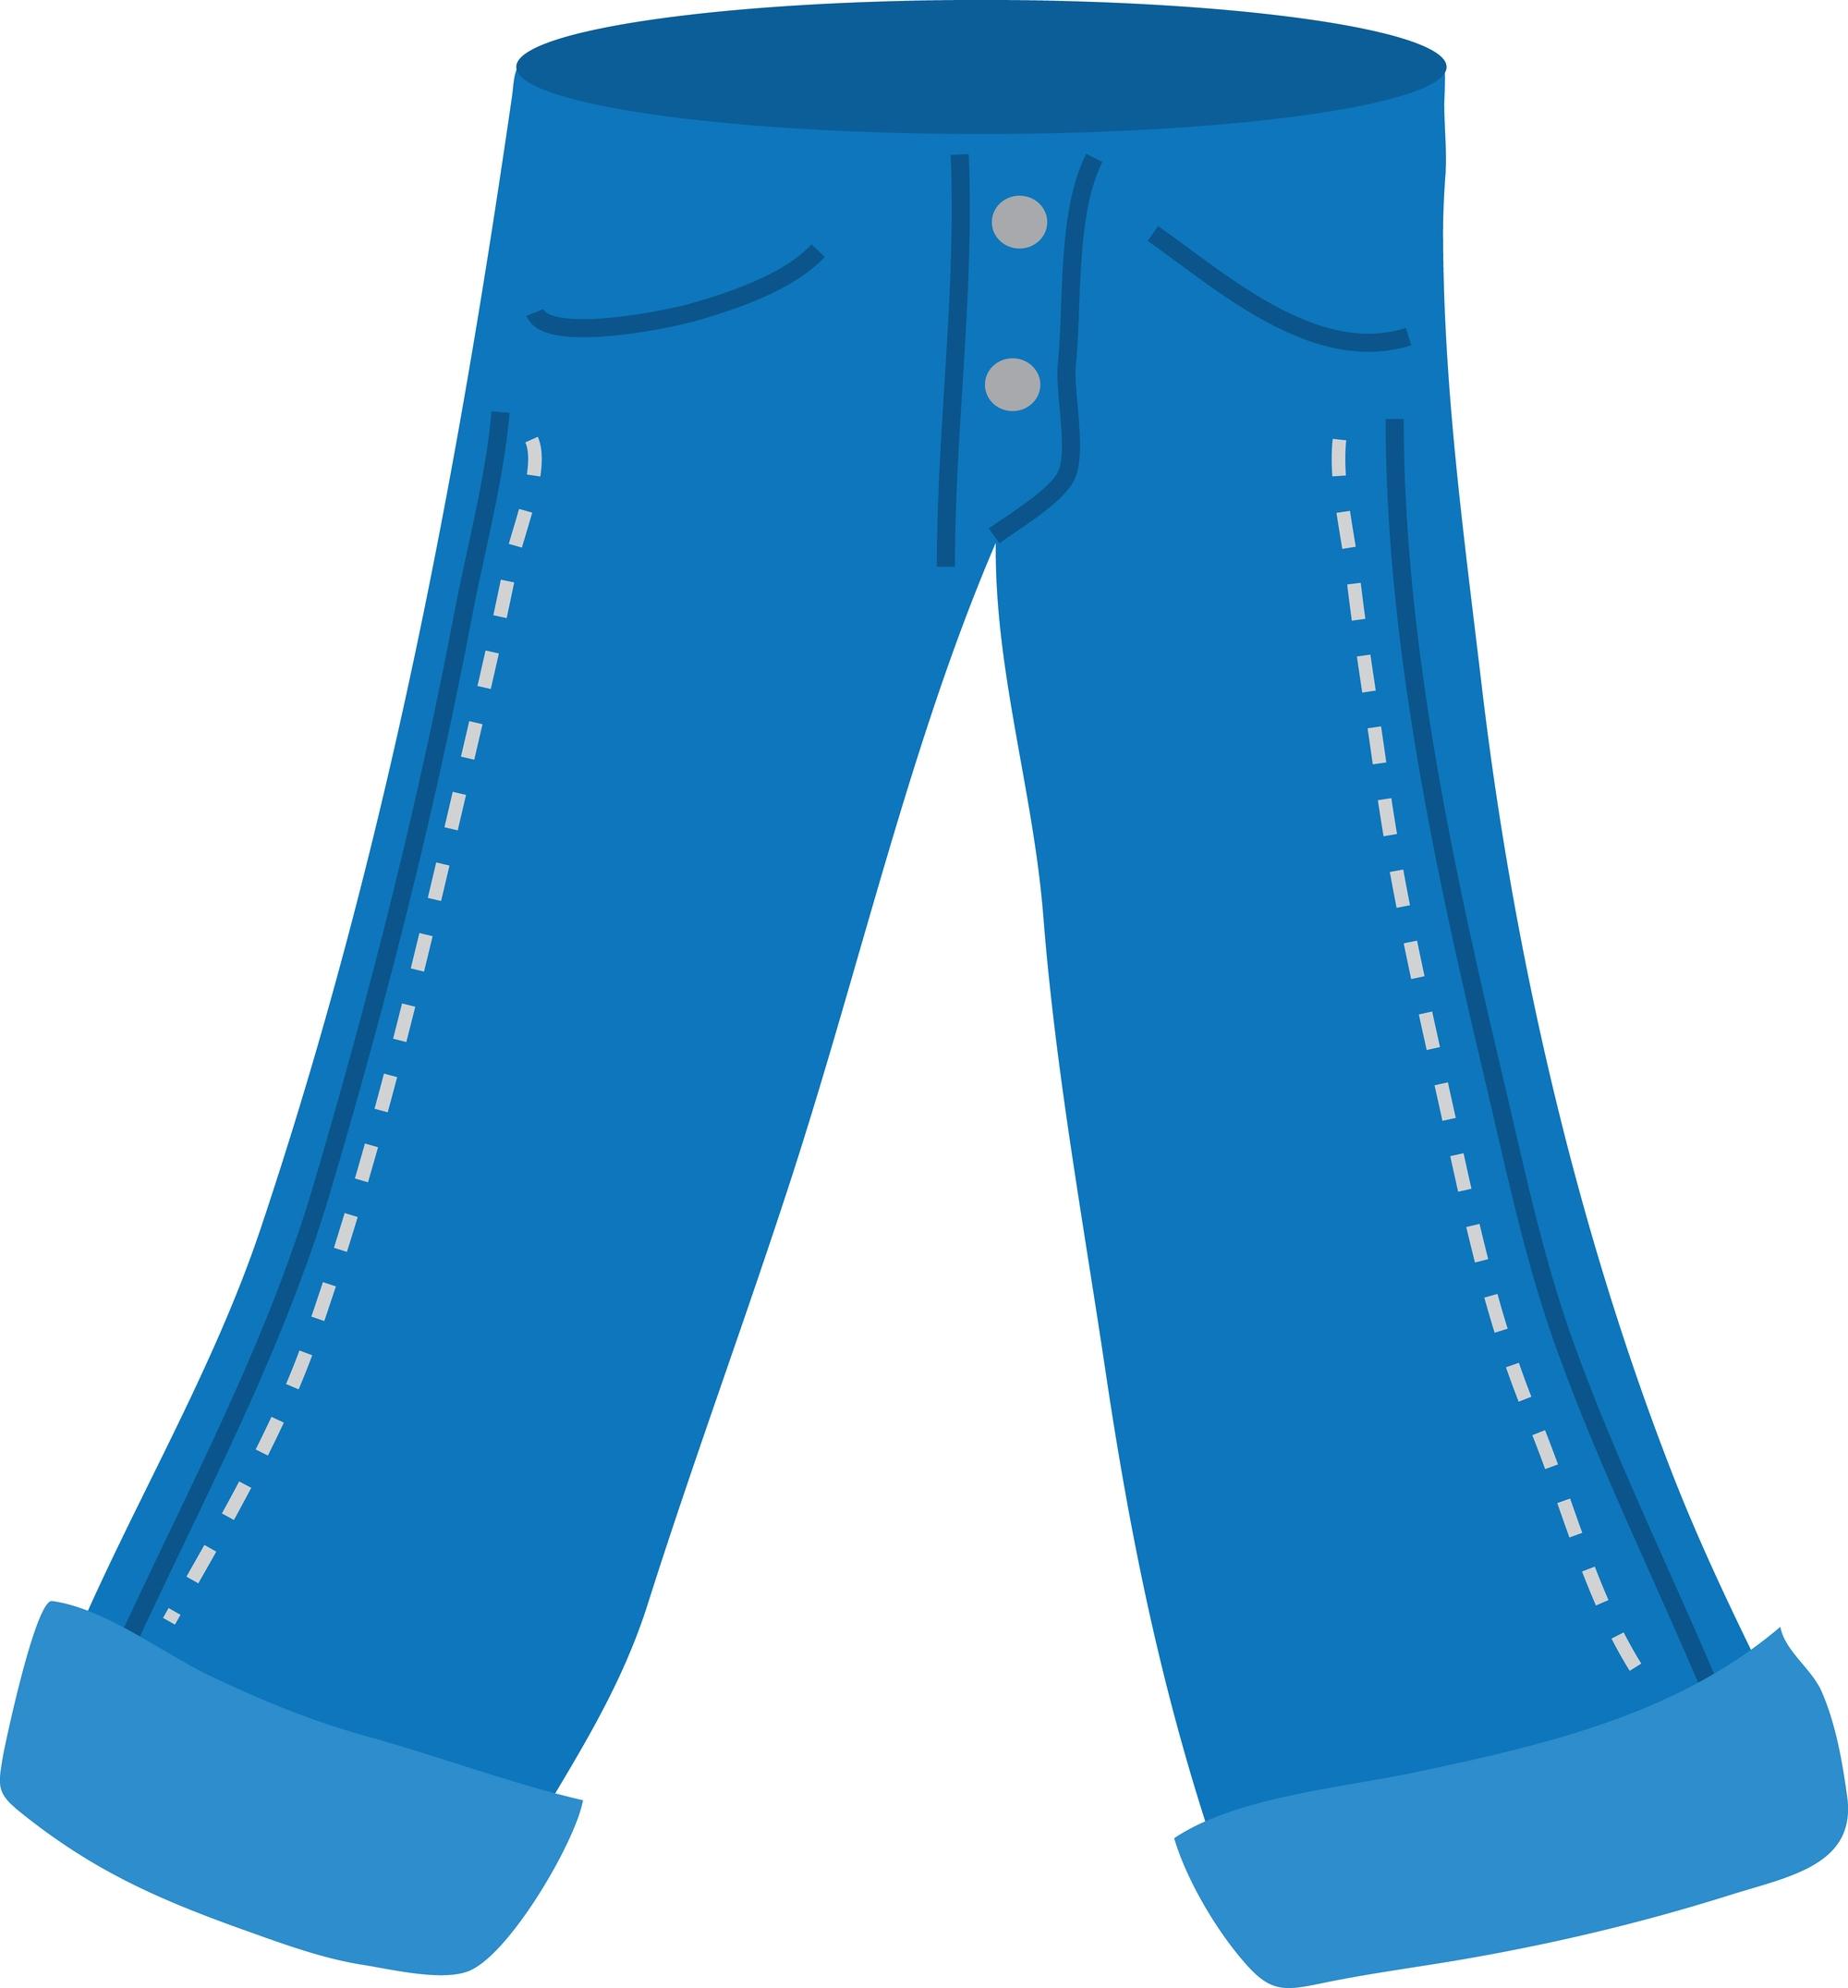 1324 Pants free clipart.